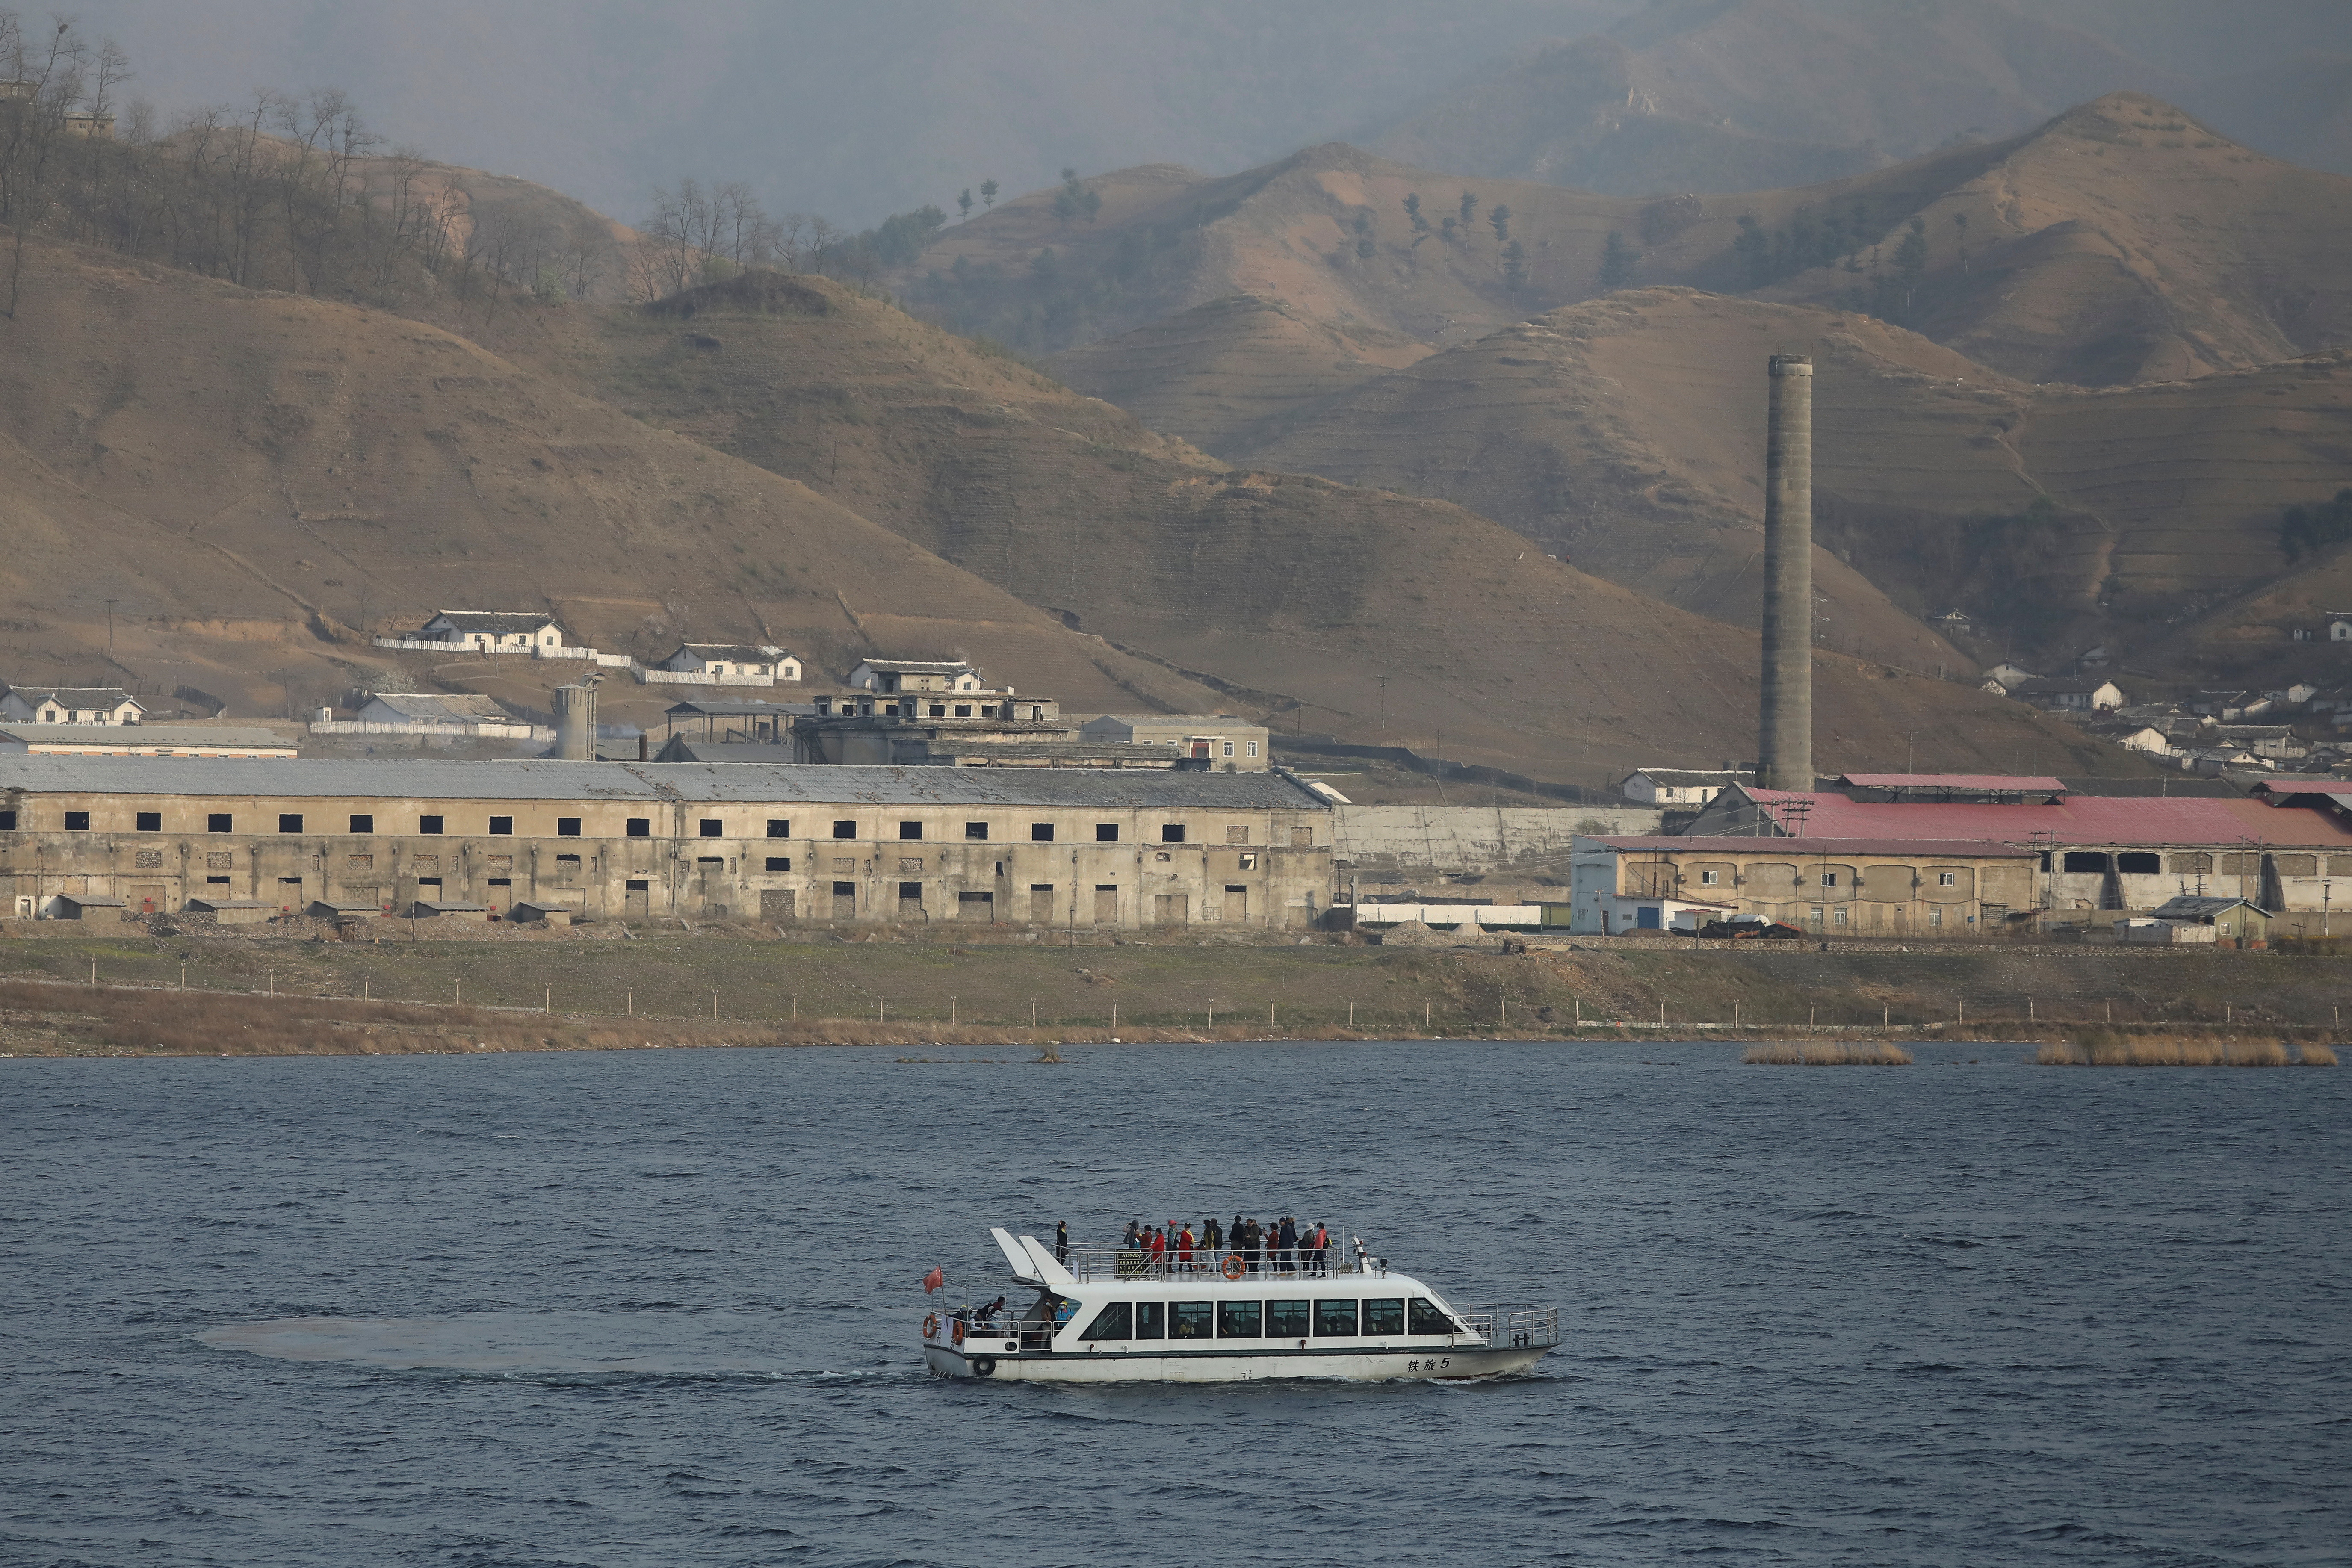 A Chinese cruise boat passes buildings in North Korea's Sinuiju on the Yalu River separating North Korea and China, in Dandong, Liaoning province, China April 20, 2021.   REUTERS/Tingshu Wang